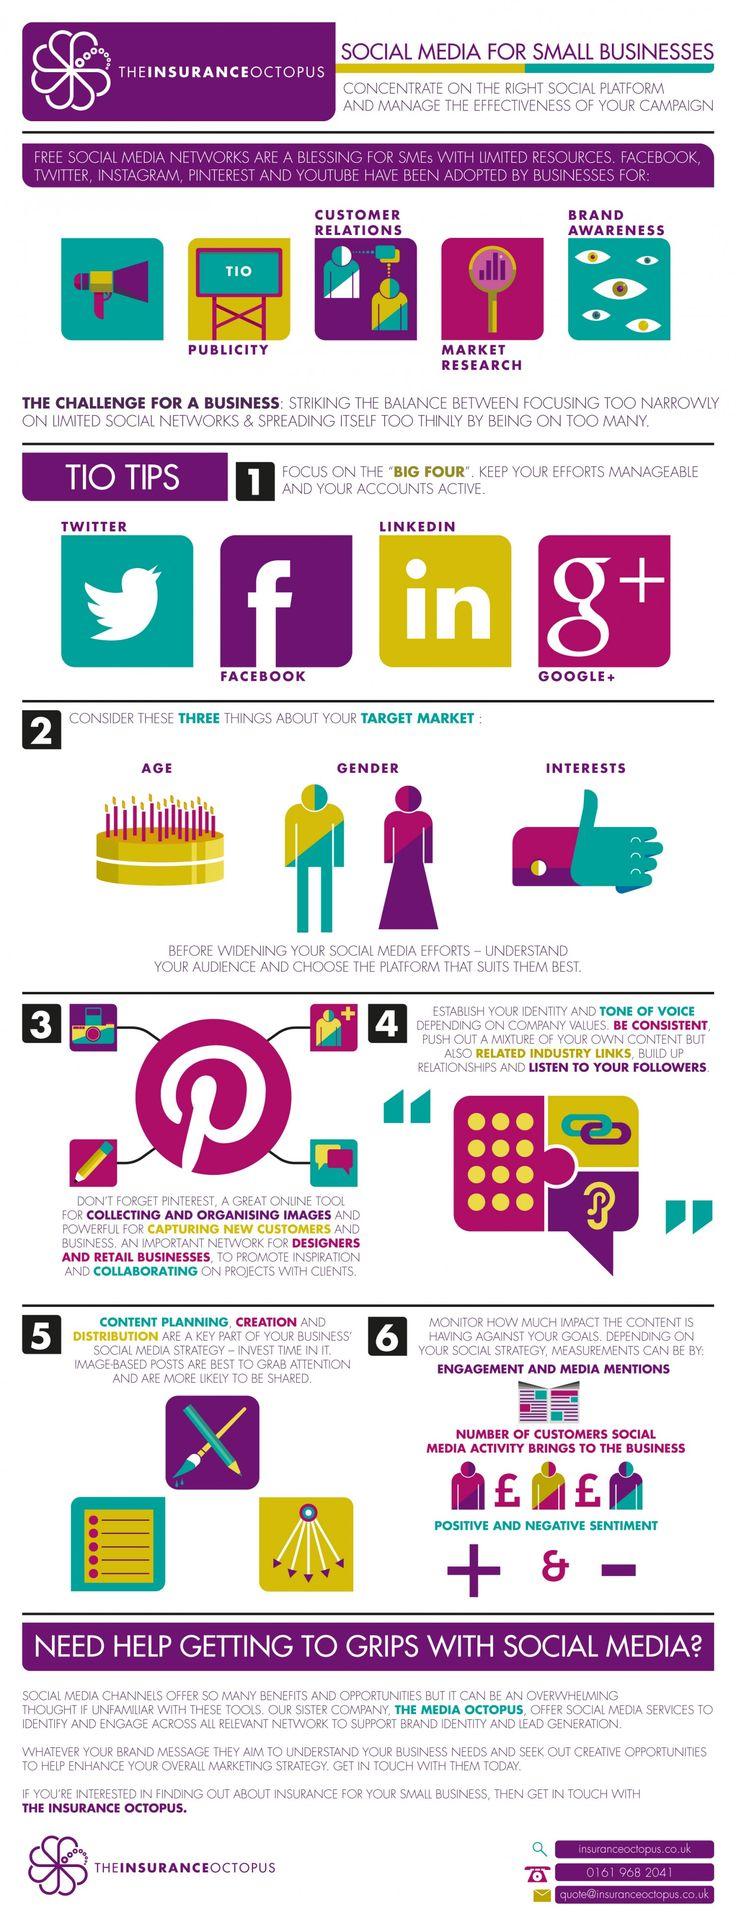 Social Media for Small Businesses | #infographic #marketingonline